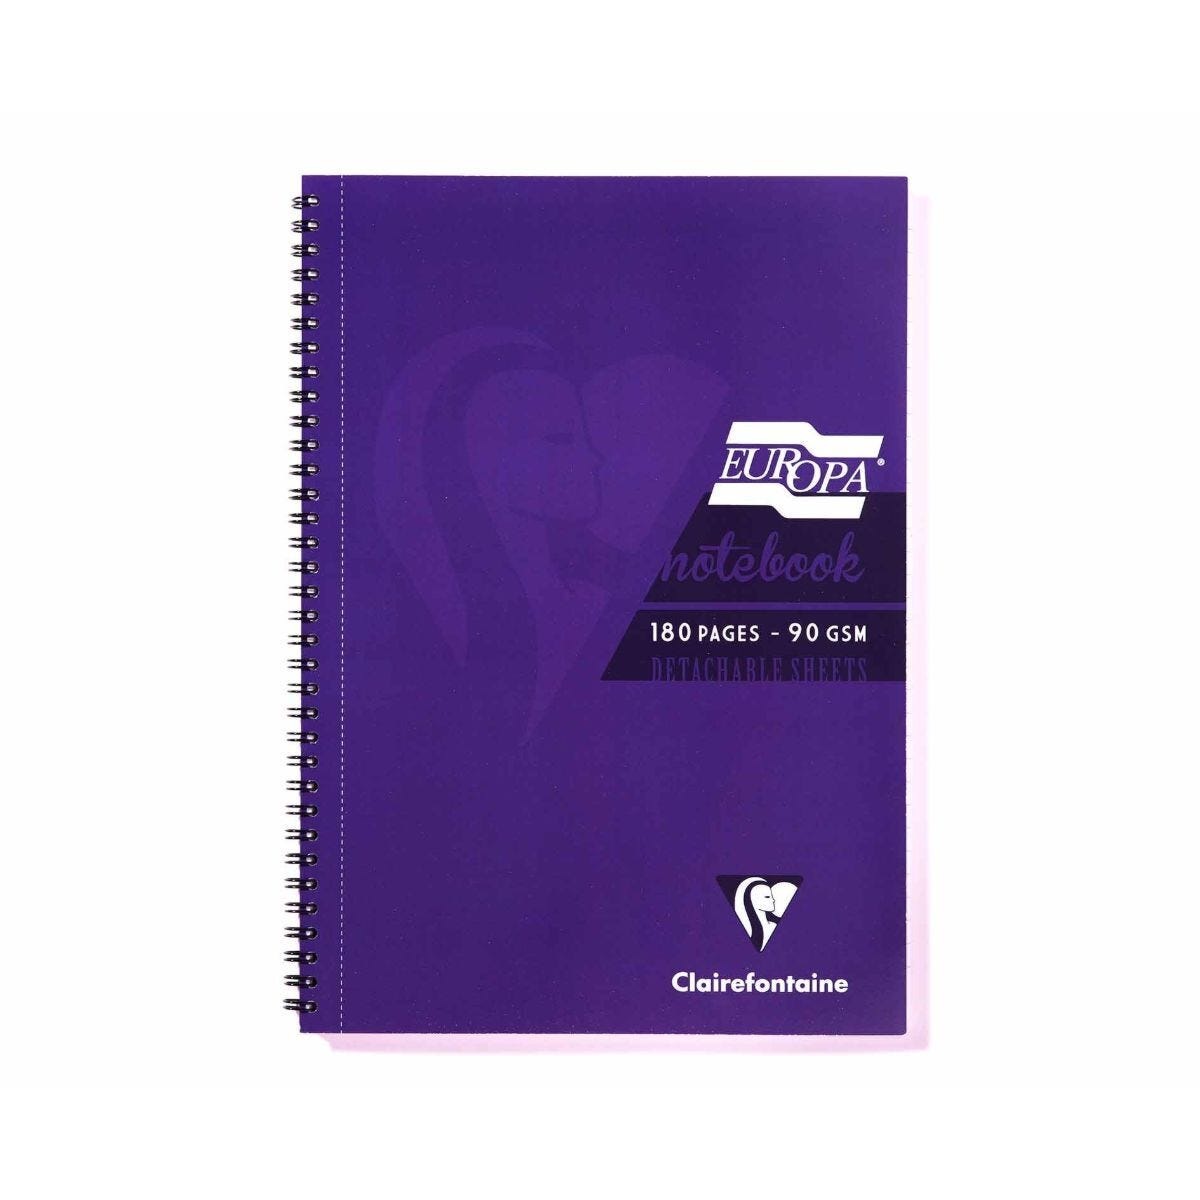 Europa Notebook A4 Purple